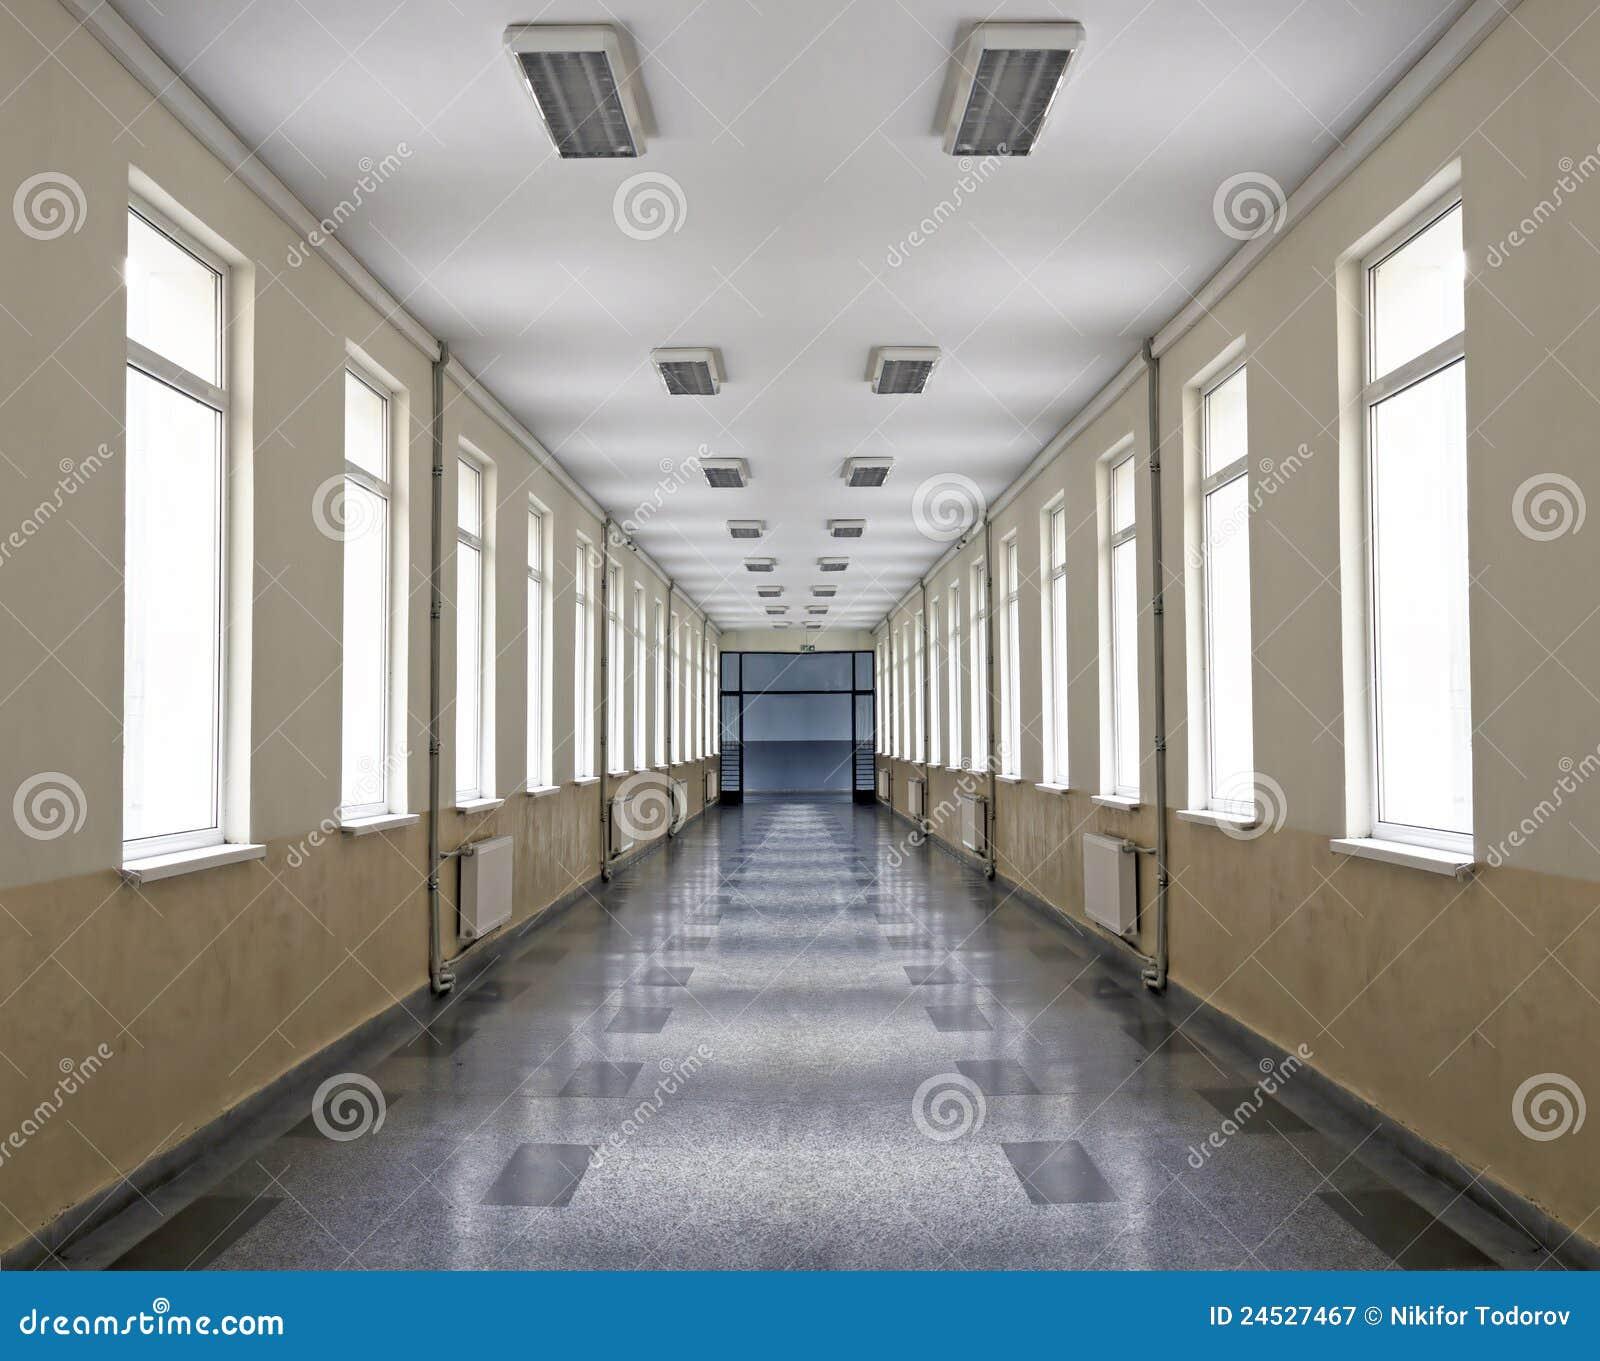 School Corridor Stock Image Image Of Linoleum Lighted